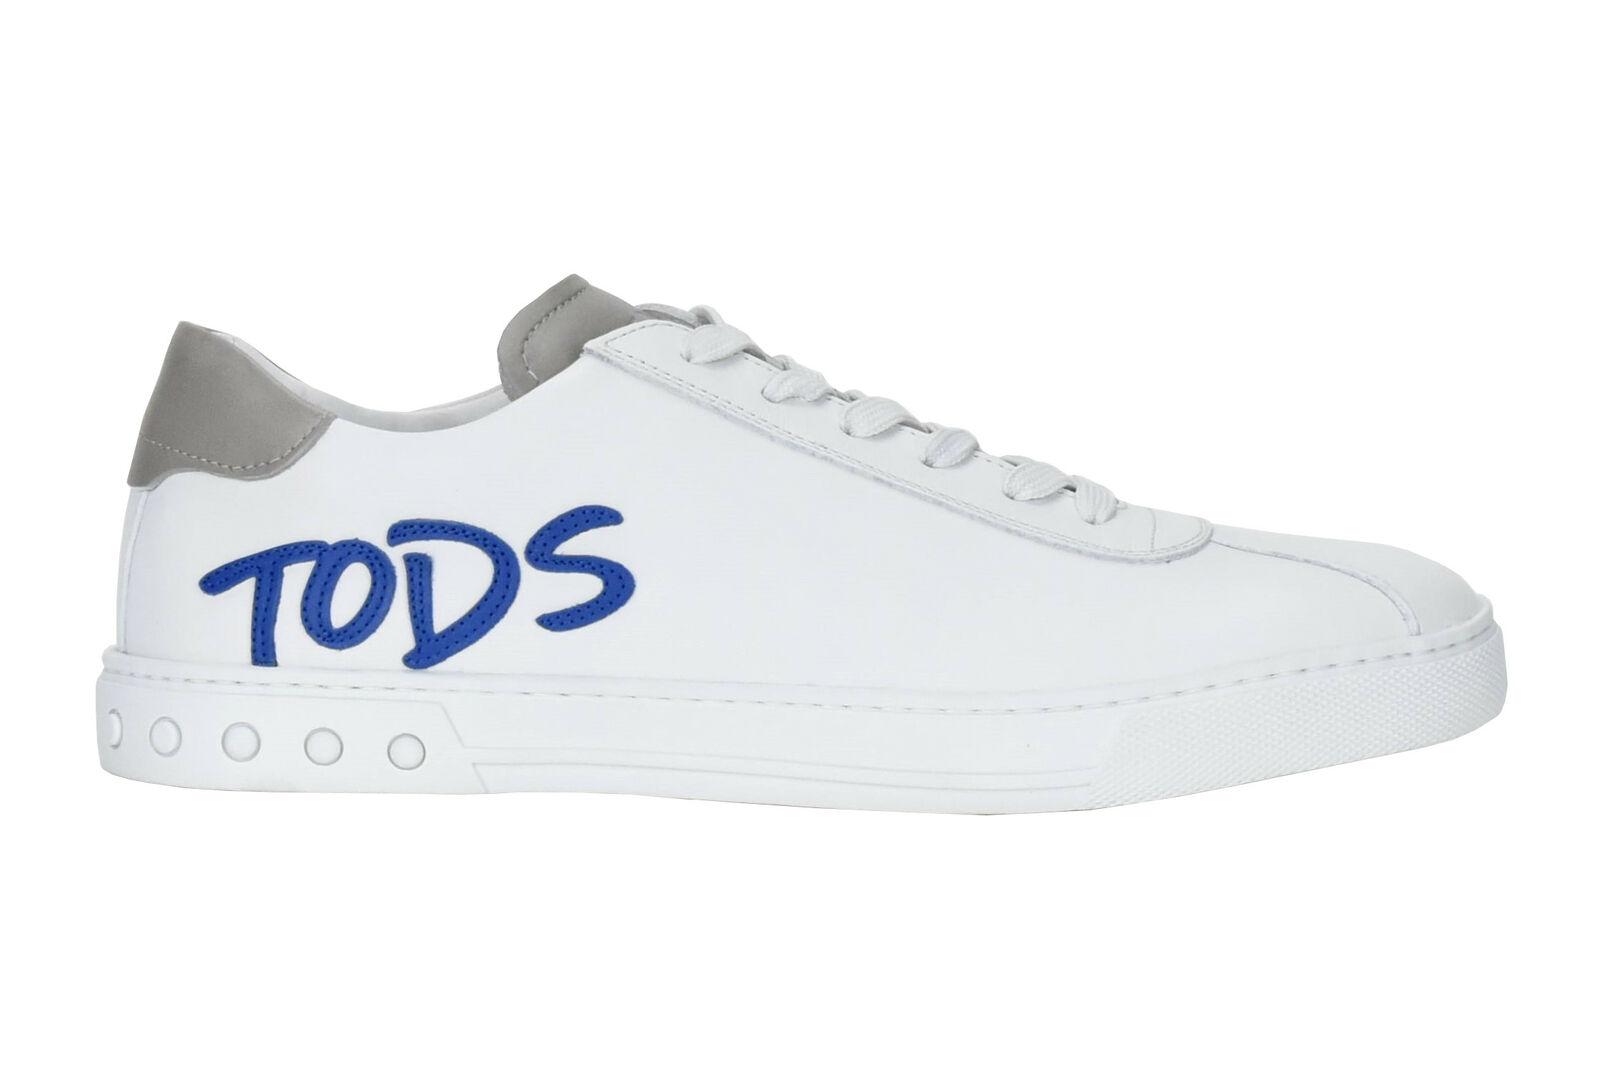 TOD'S Zapatillas Hombres Men's zapatos S8.TD06